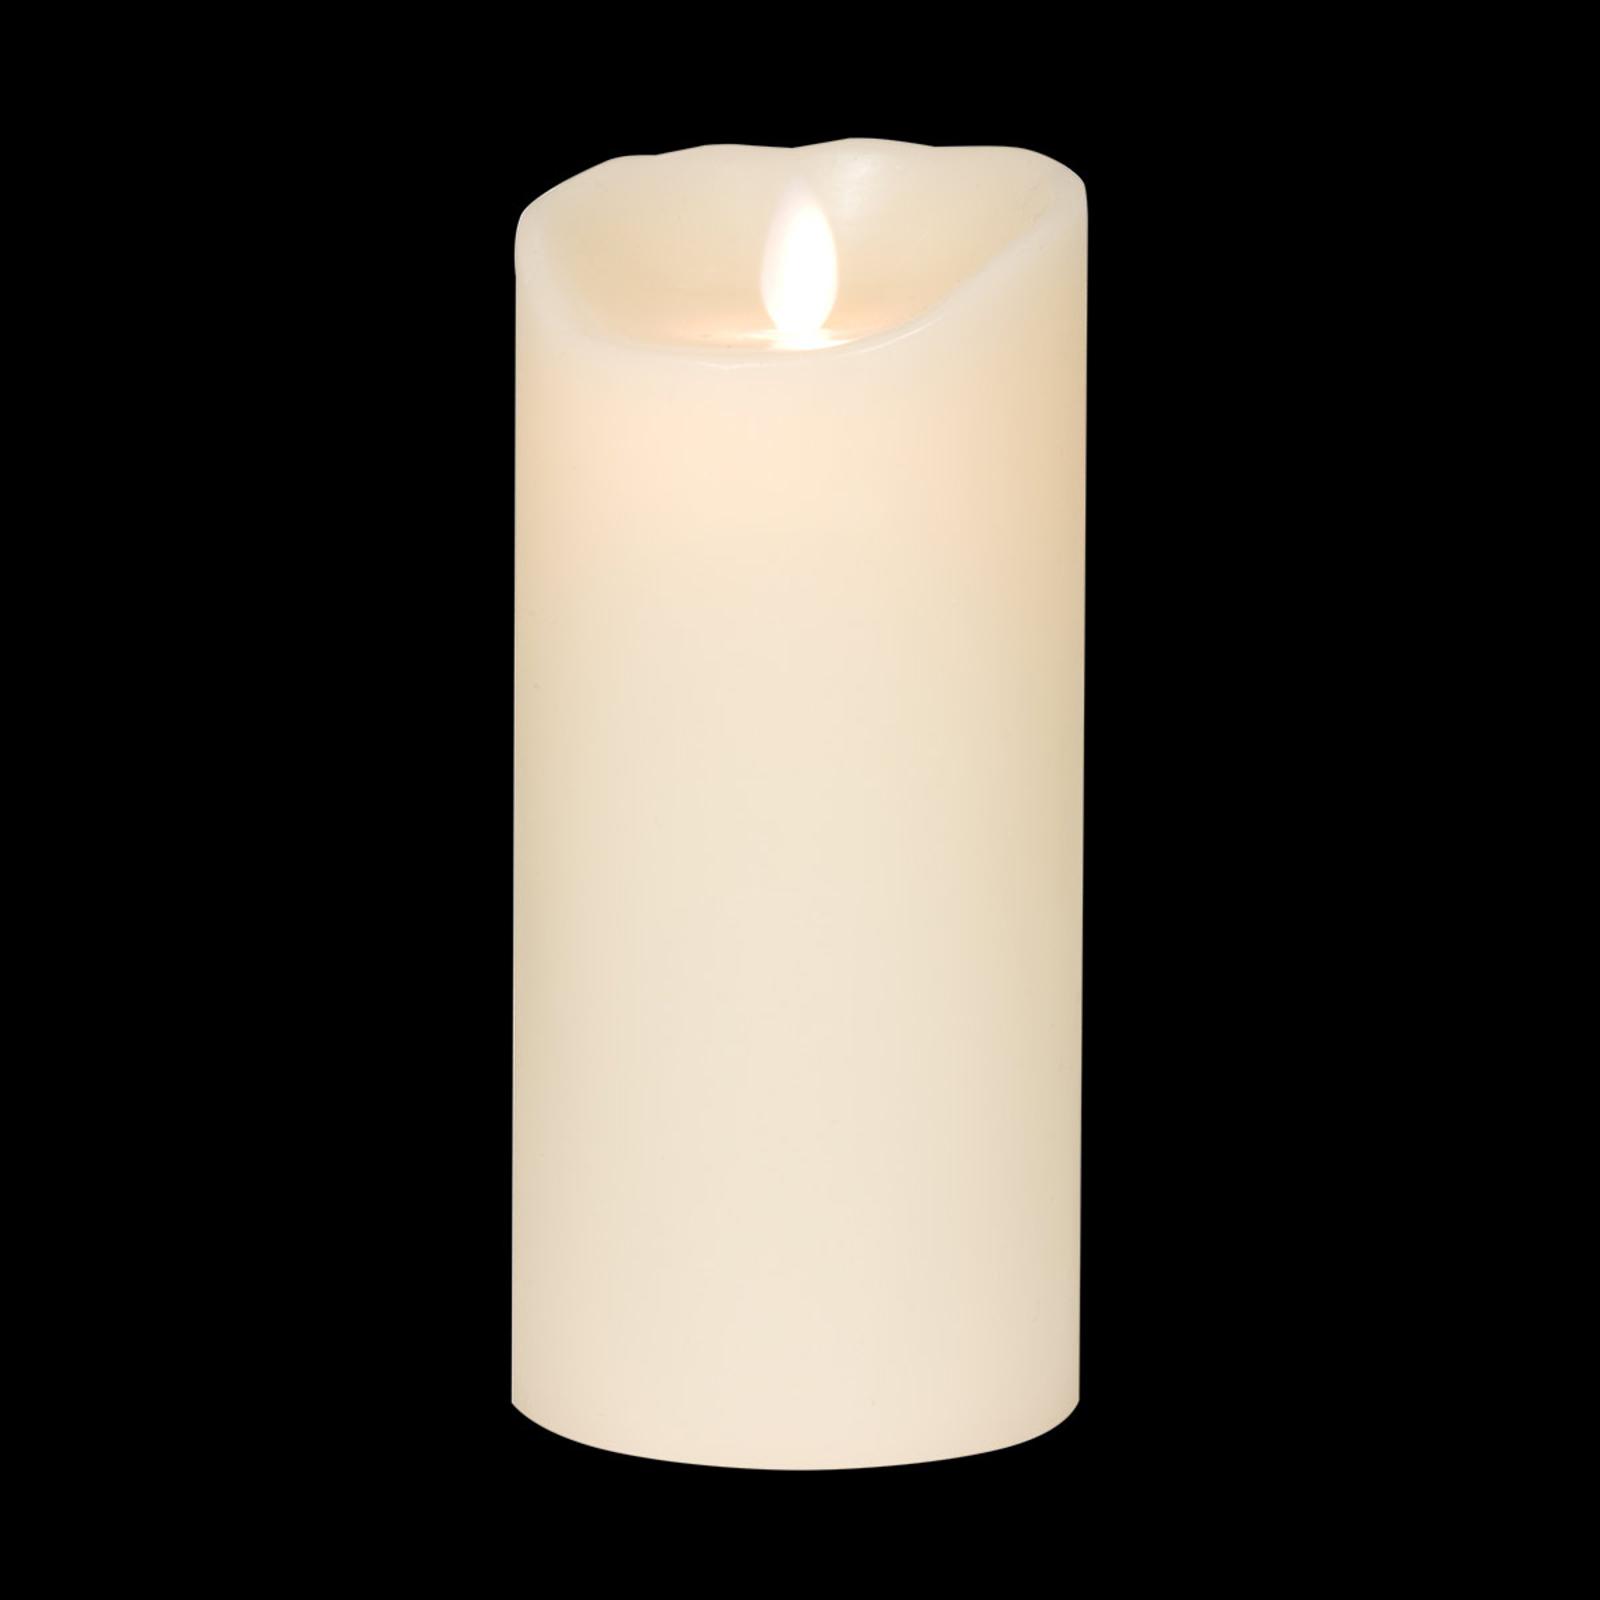 LED-kynttilä Flame aidosta vahasta 23 cm